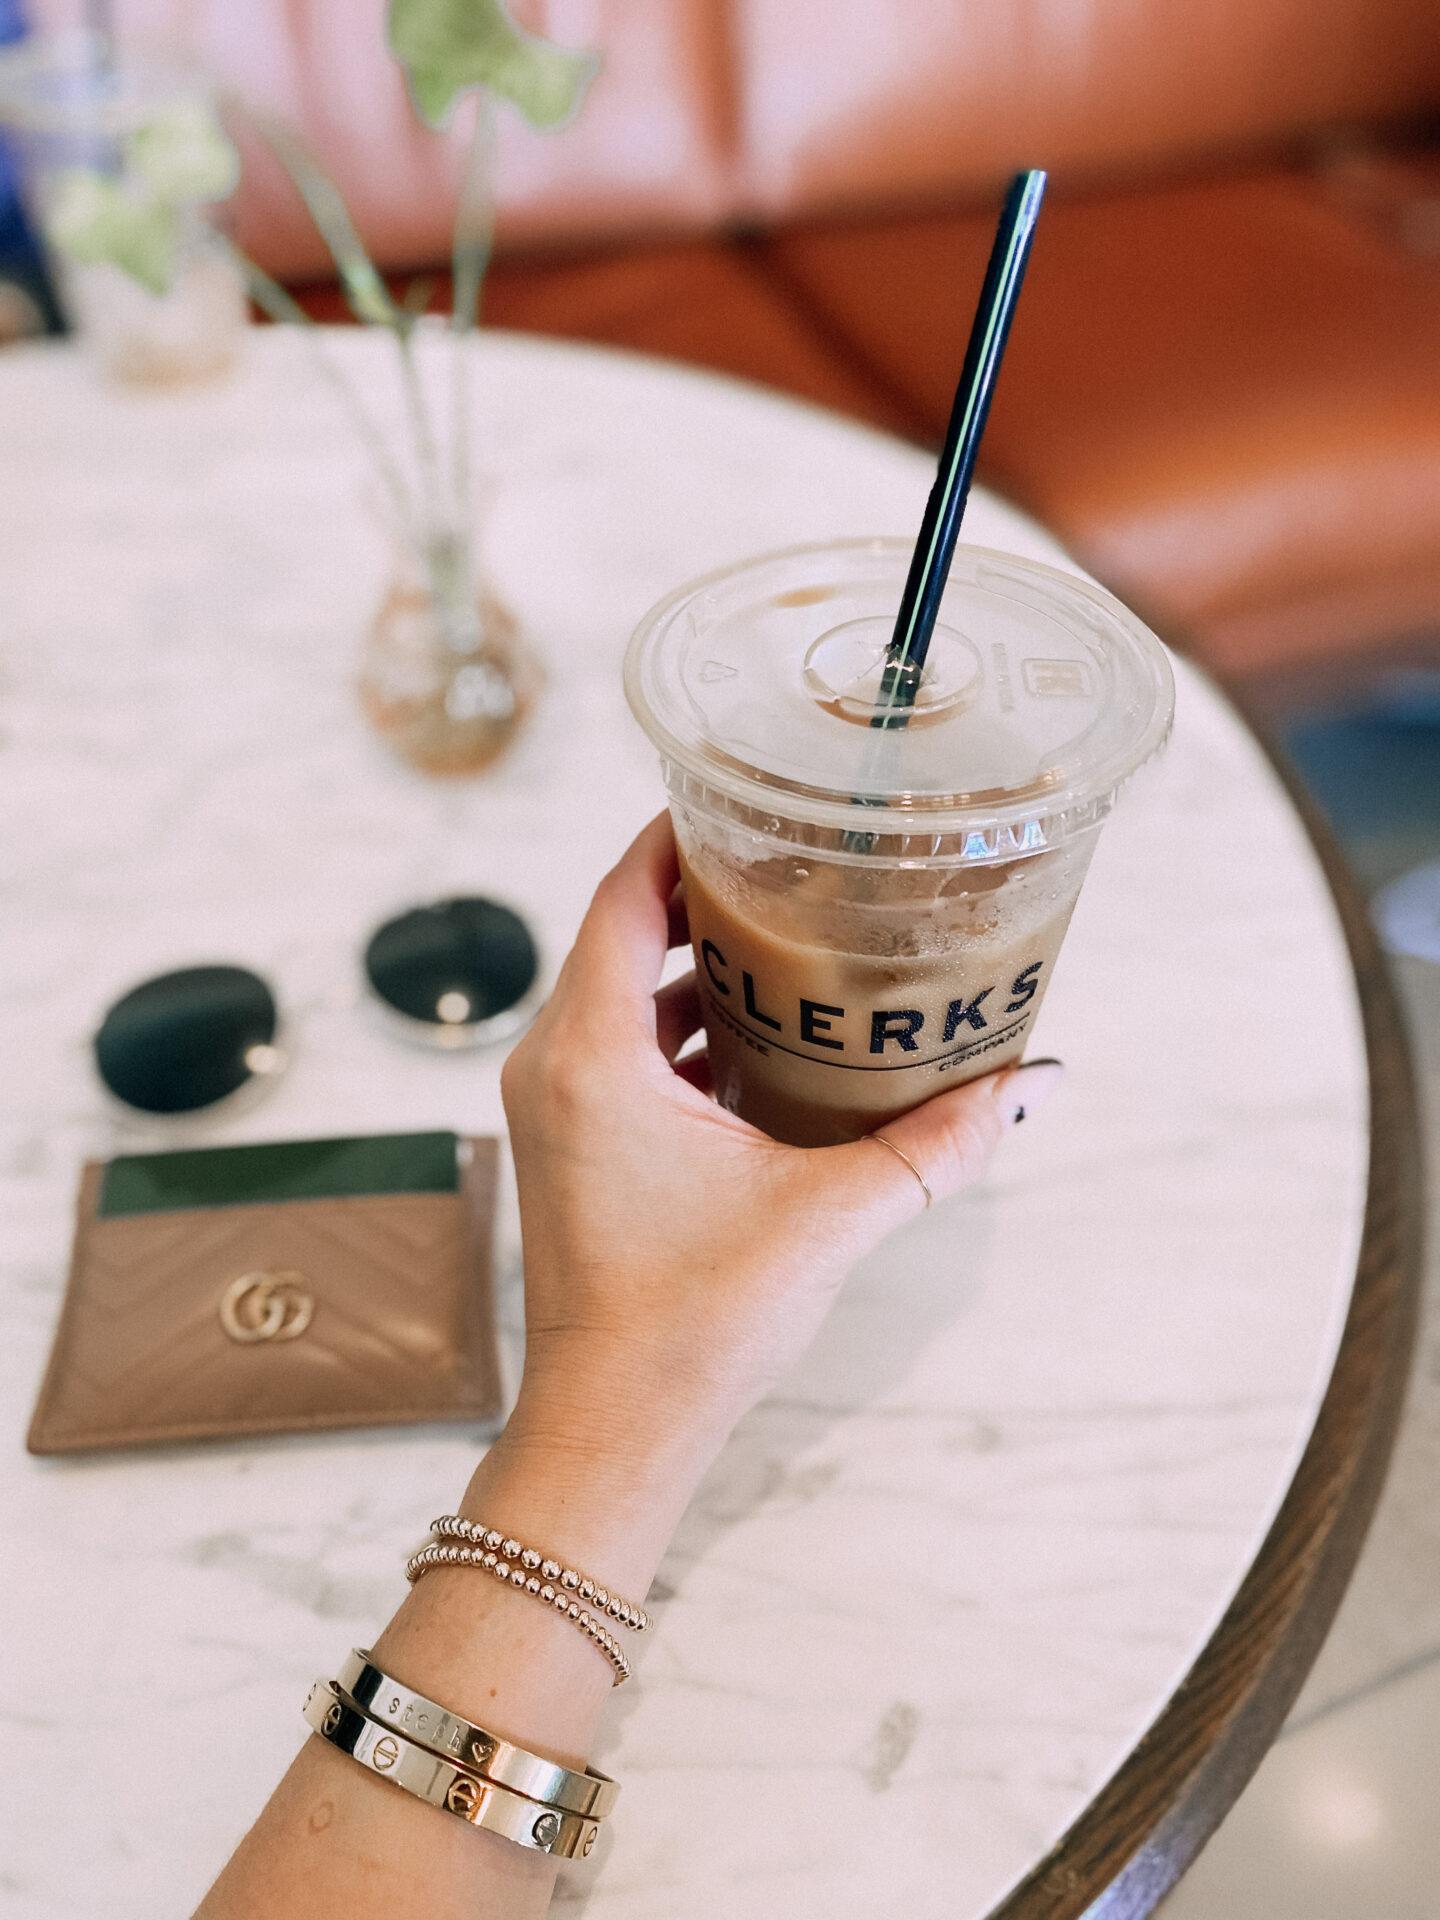 hotel emeline charleston review - clerks coffee